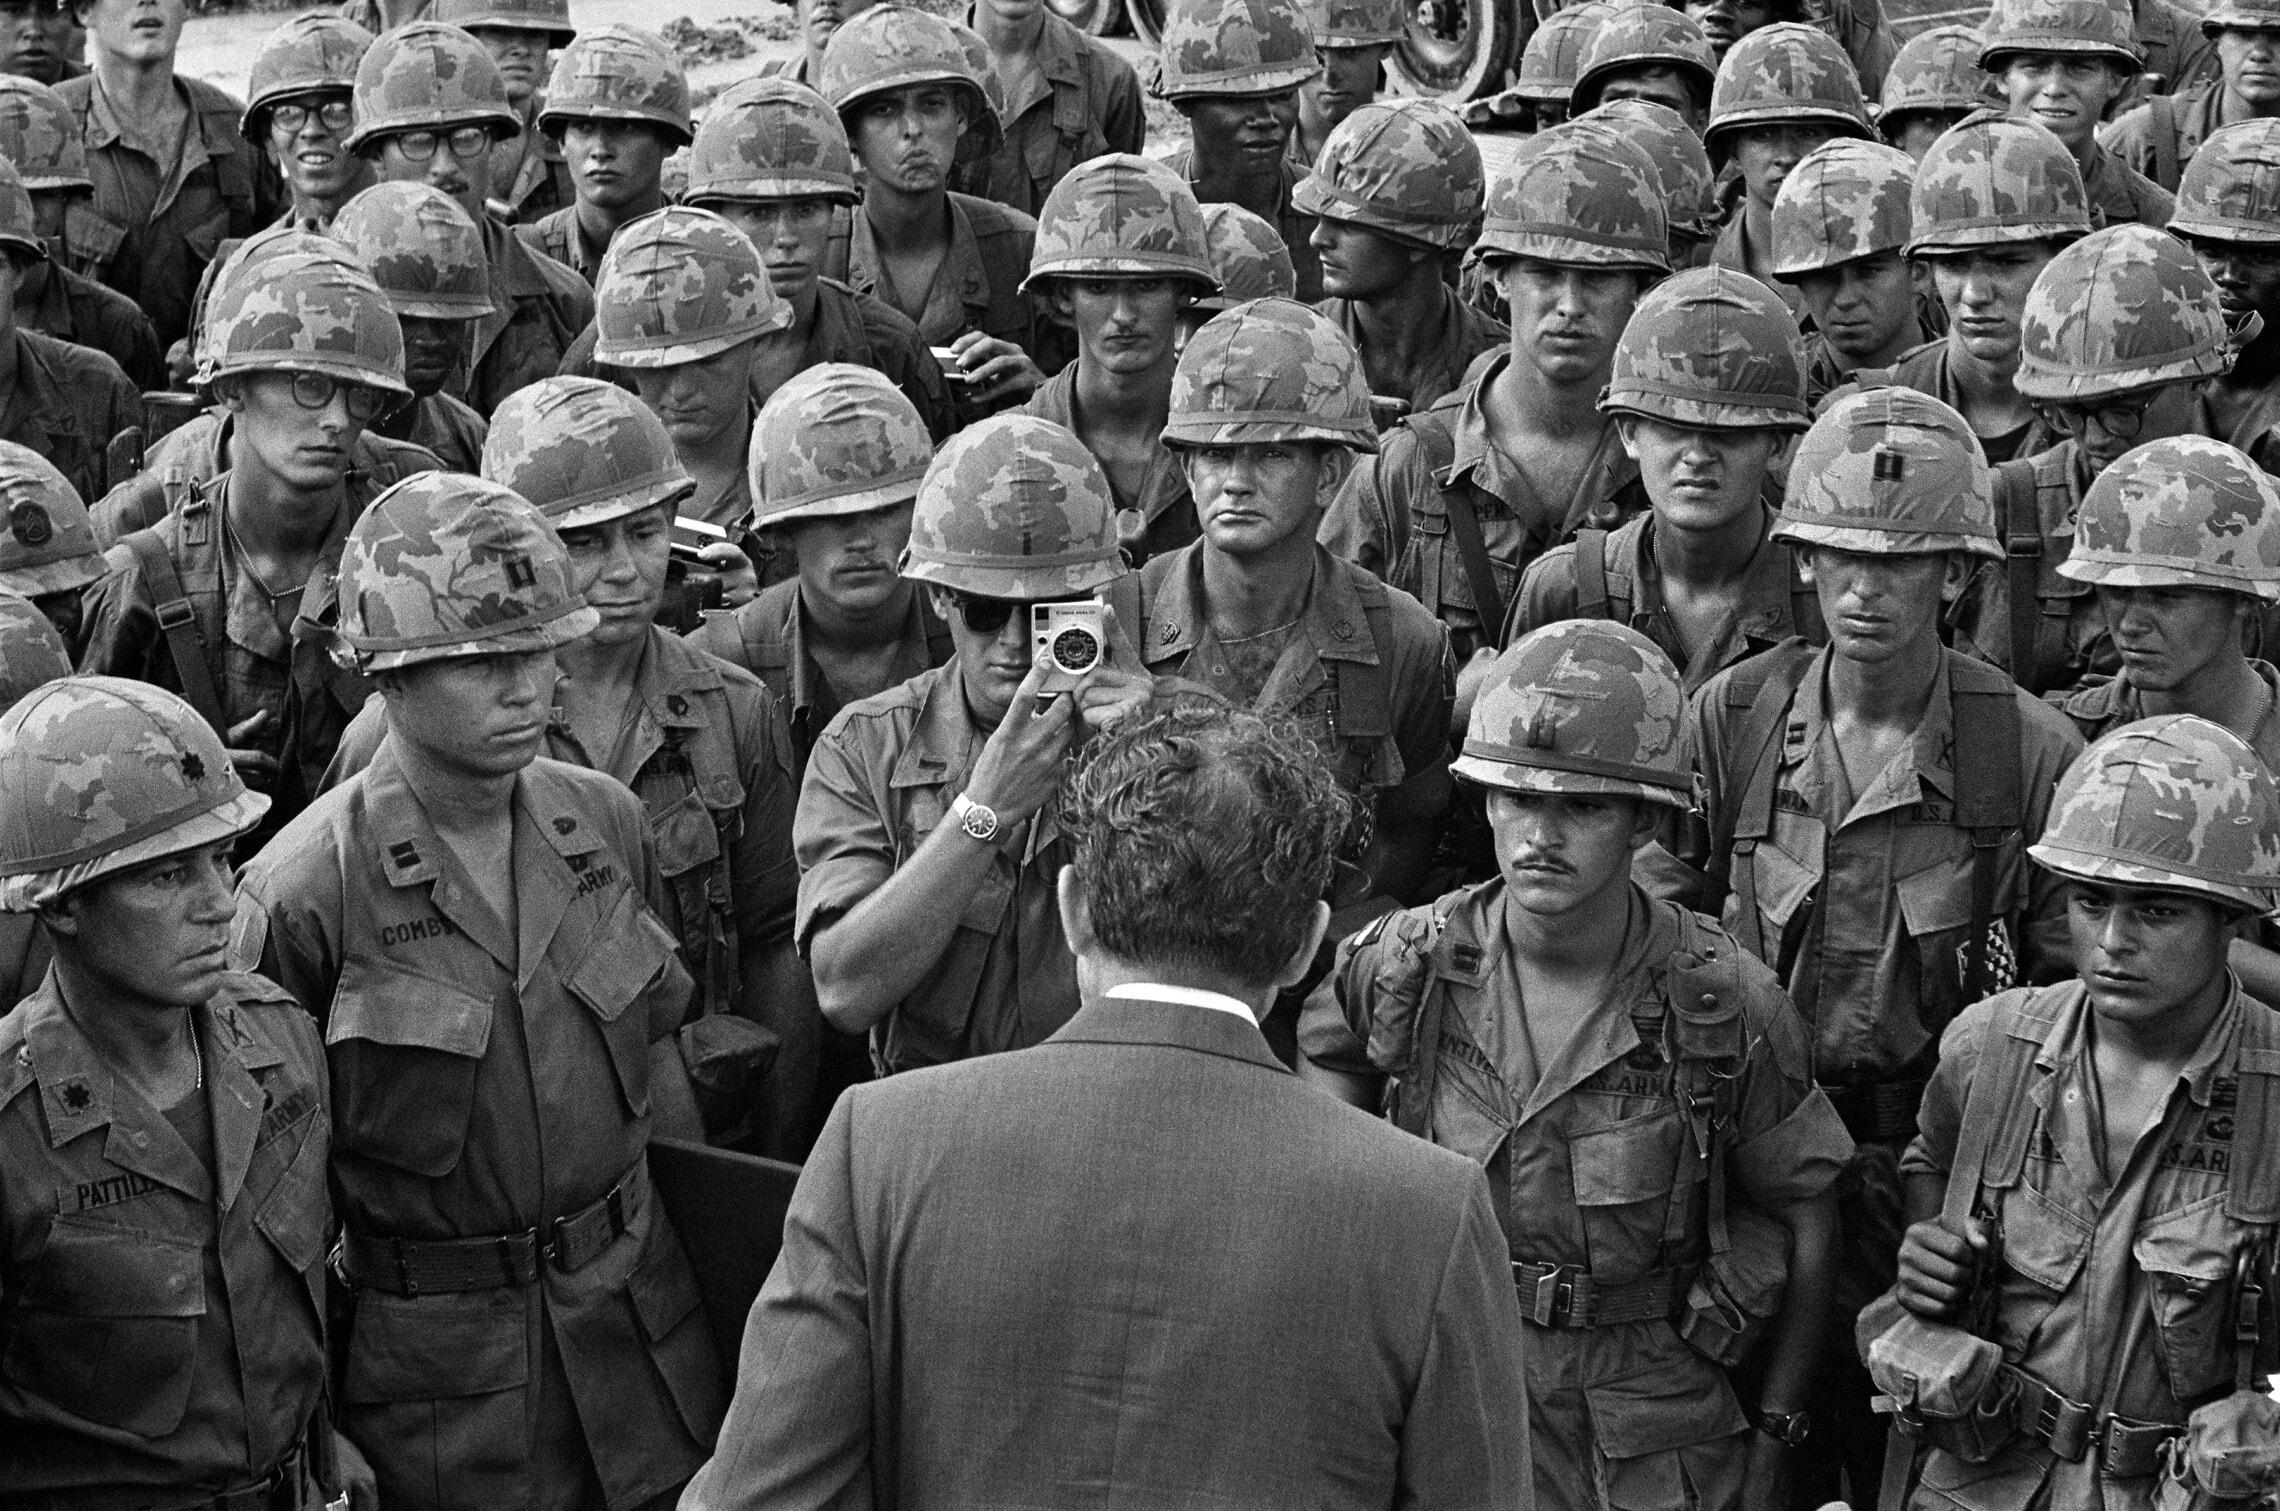 חיילי צבא ארצות הברית עם הנשיא ריצ'רד ניקסון ליד סייגון, וייטנאם, ב-30 ביולי 1969 (צילום: AP Photo/Bob Daugherty)